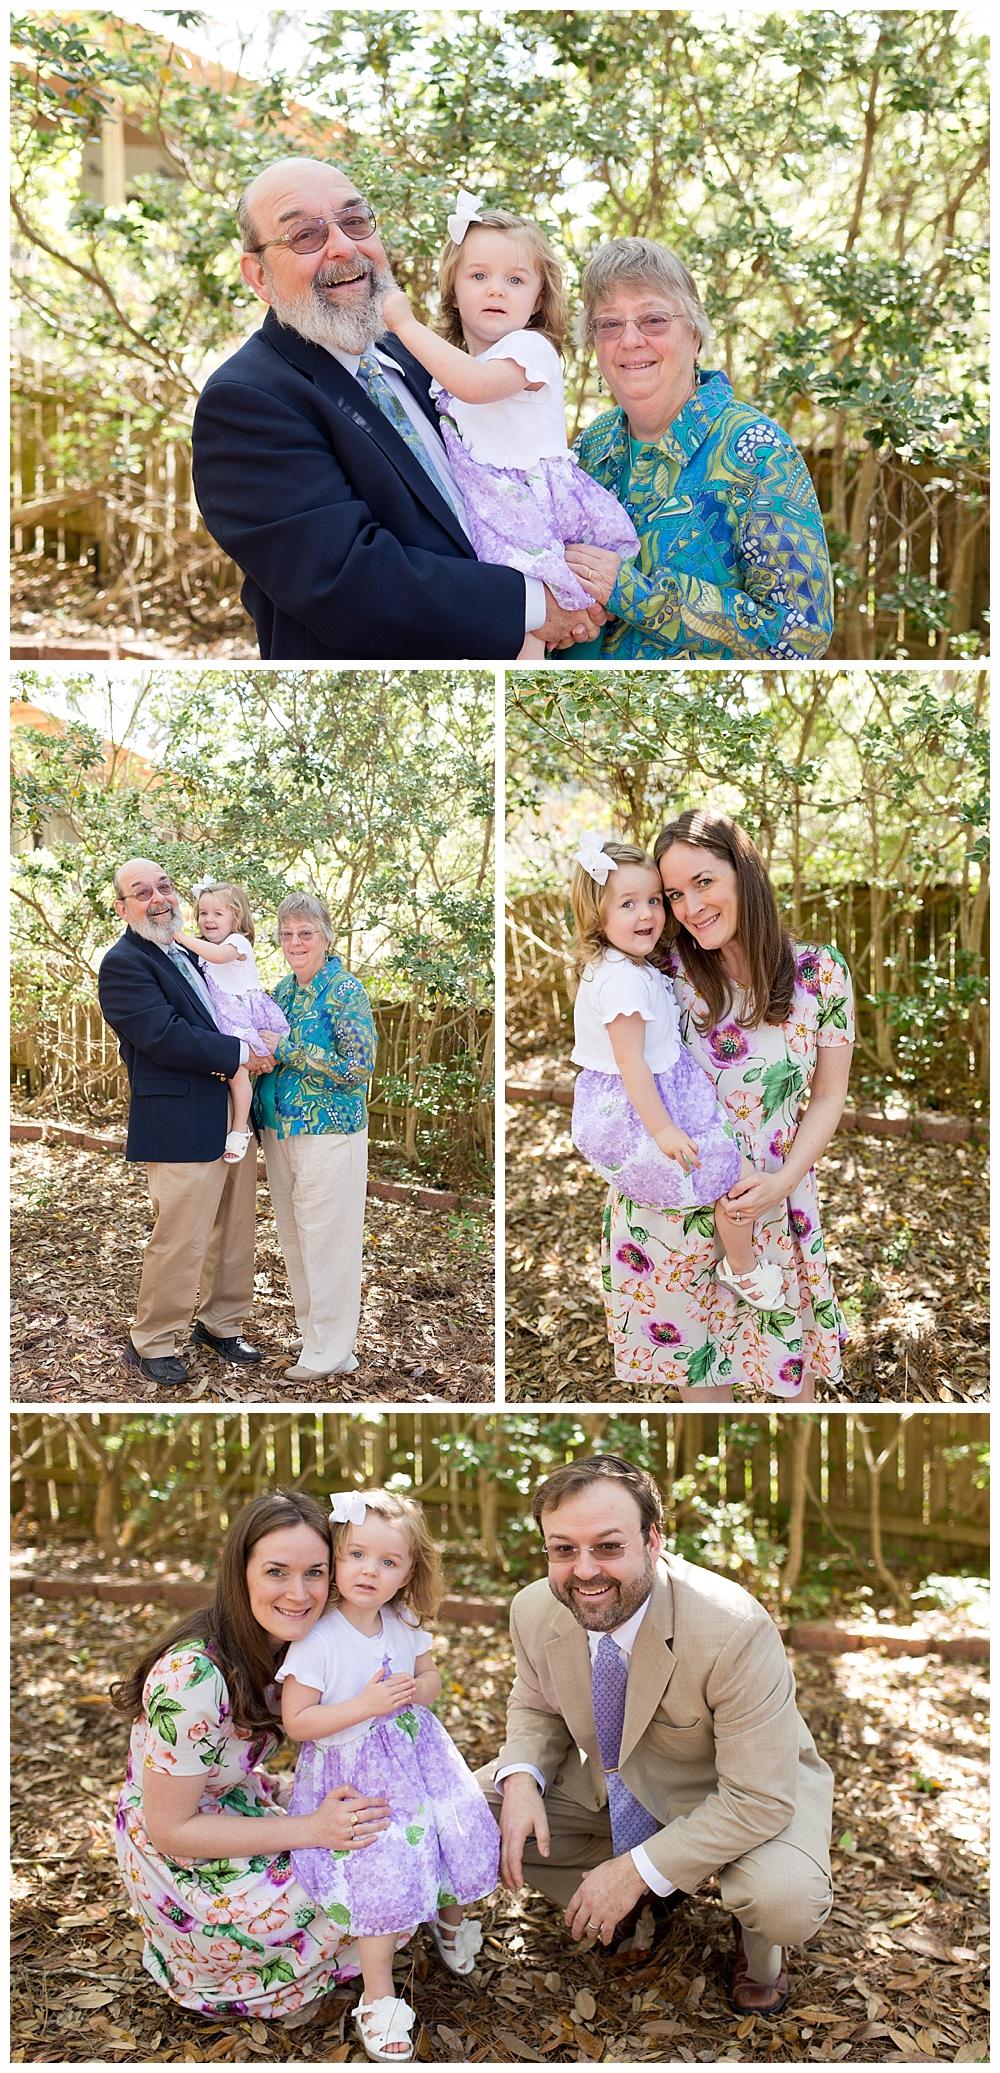 family photos before church on Easter Sunday - Ocean Springs, Mississippi